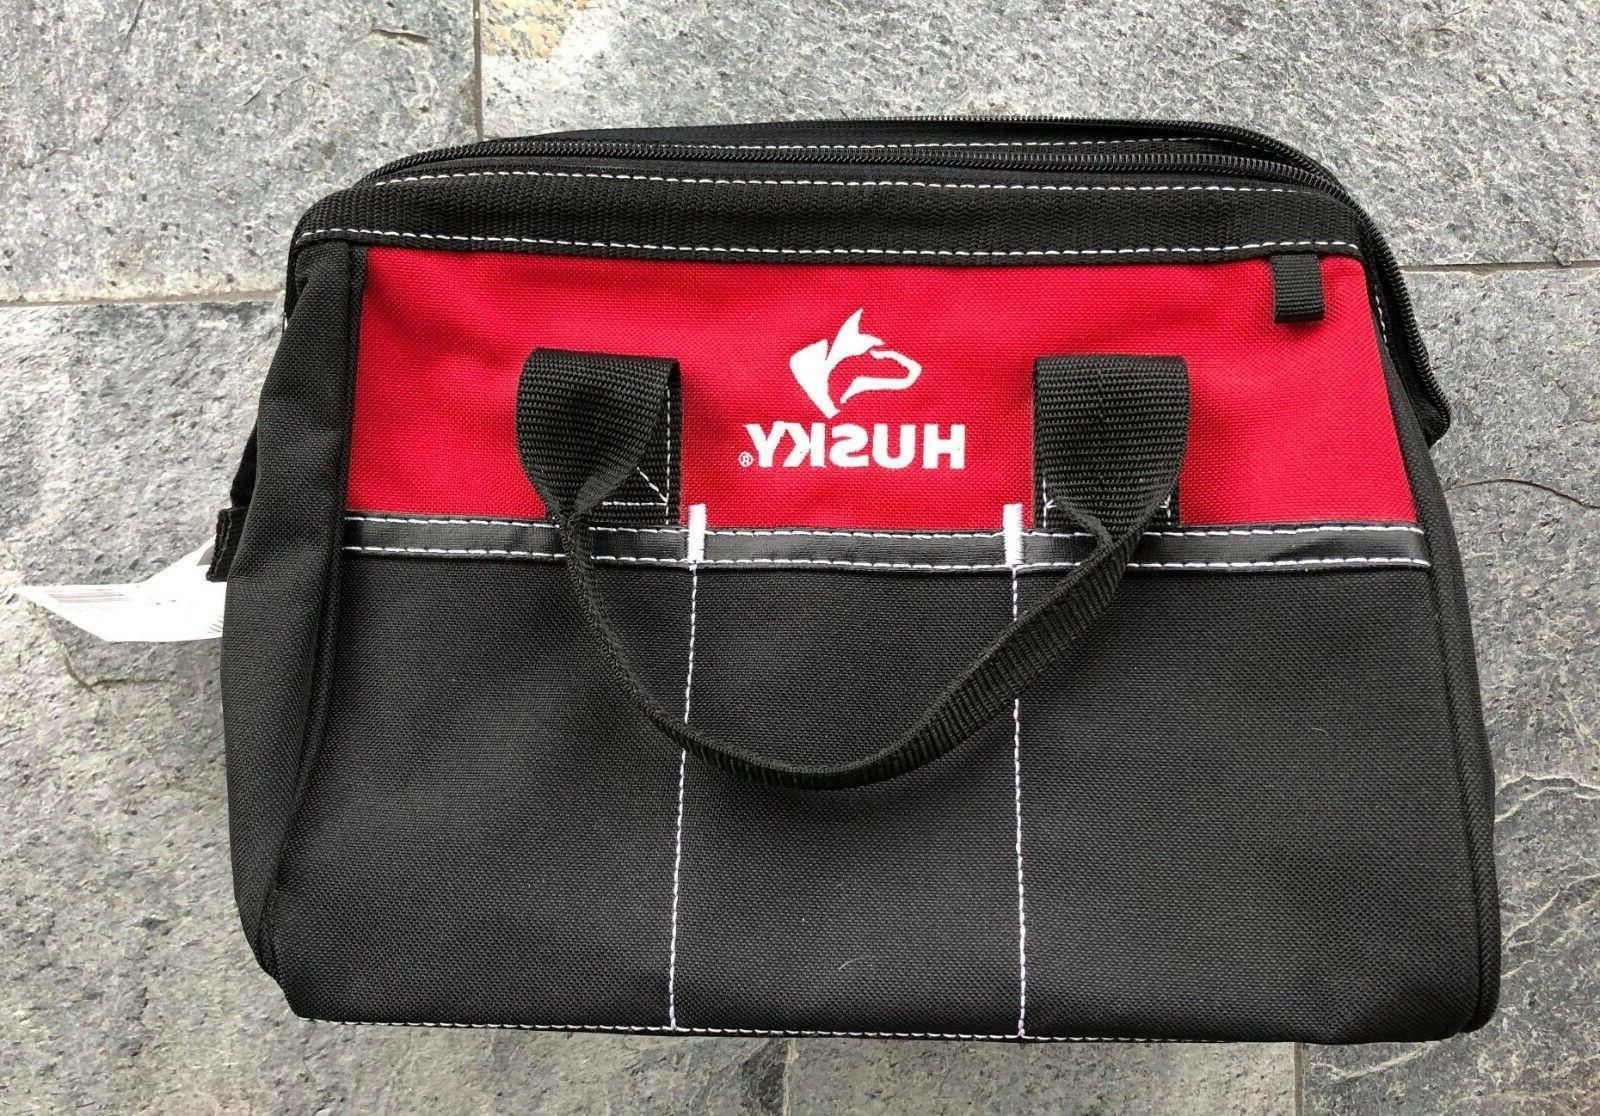 12 tool bag storage organizer water resistant